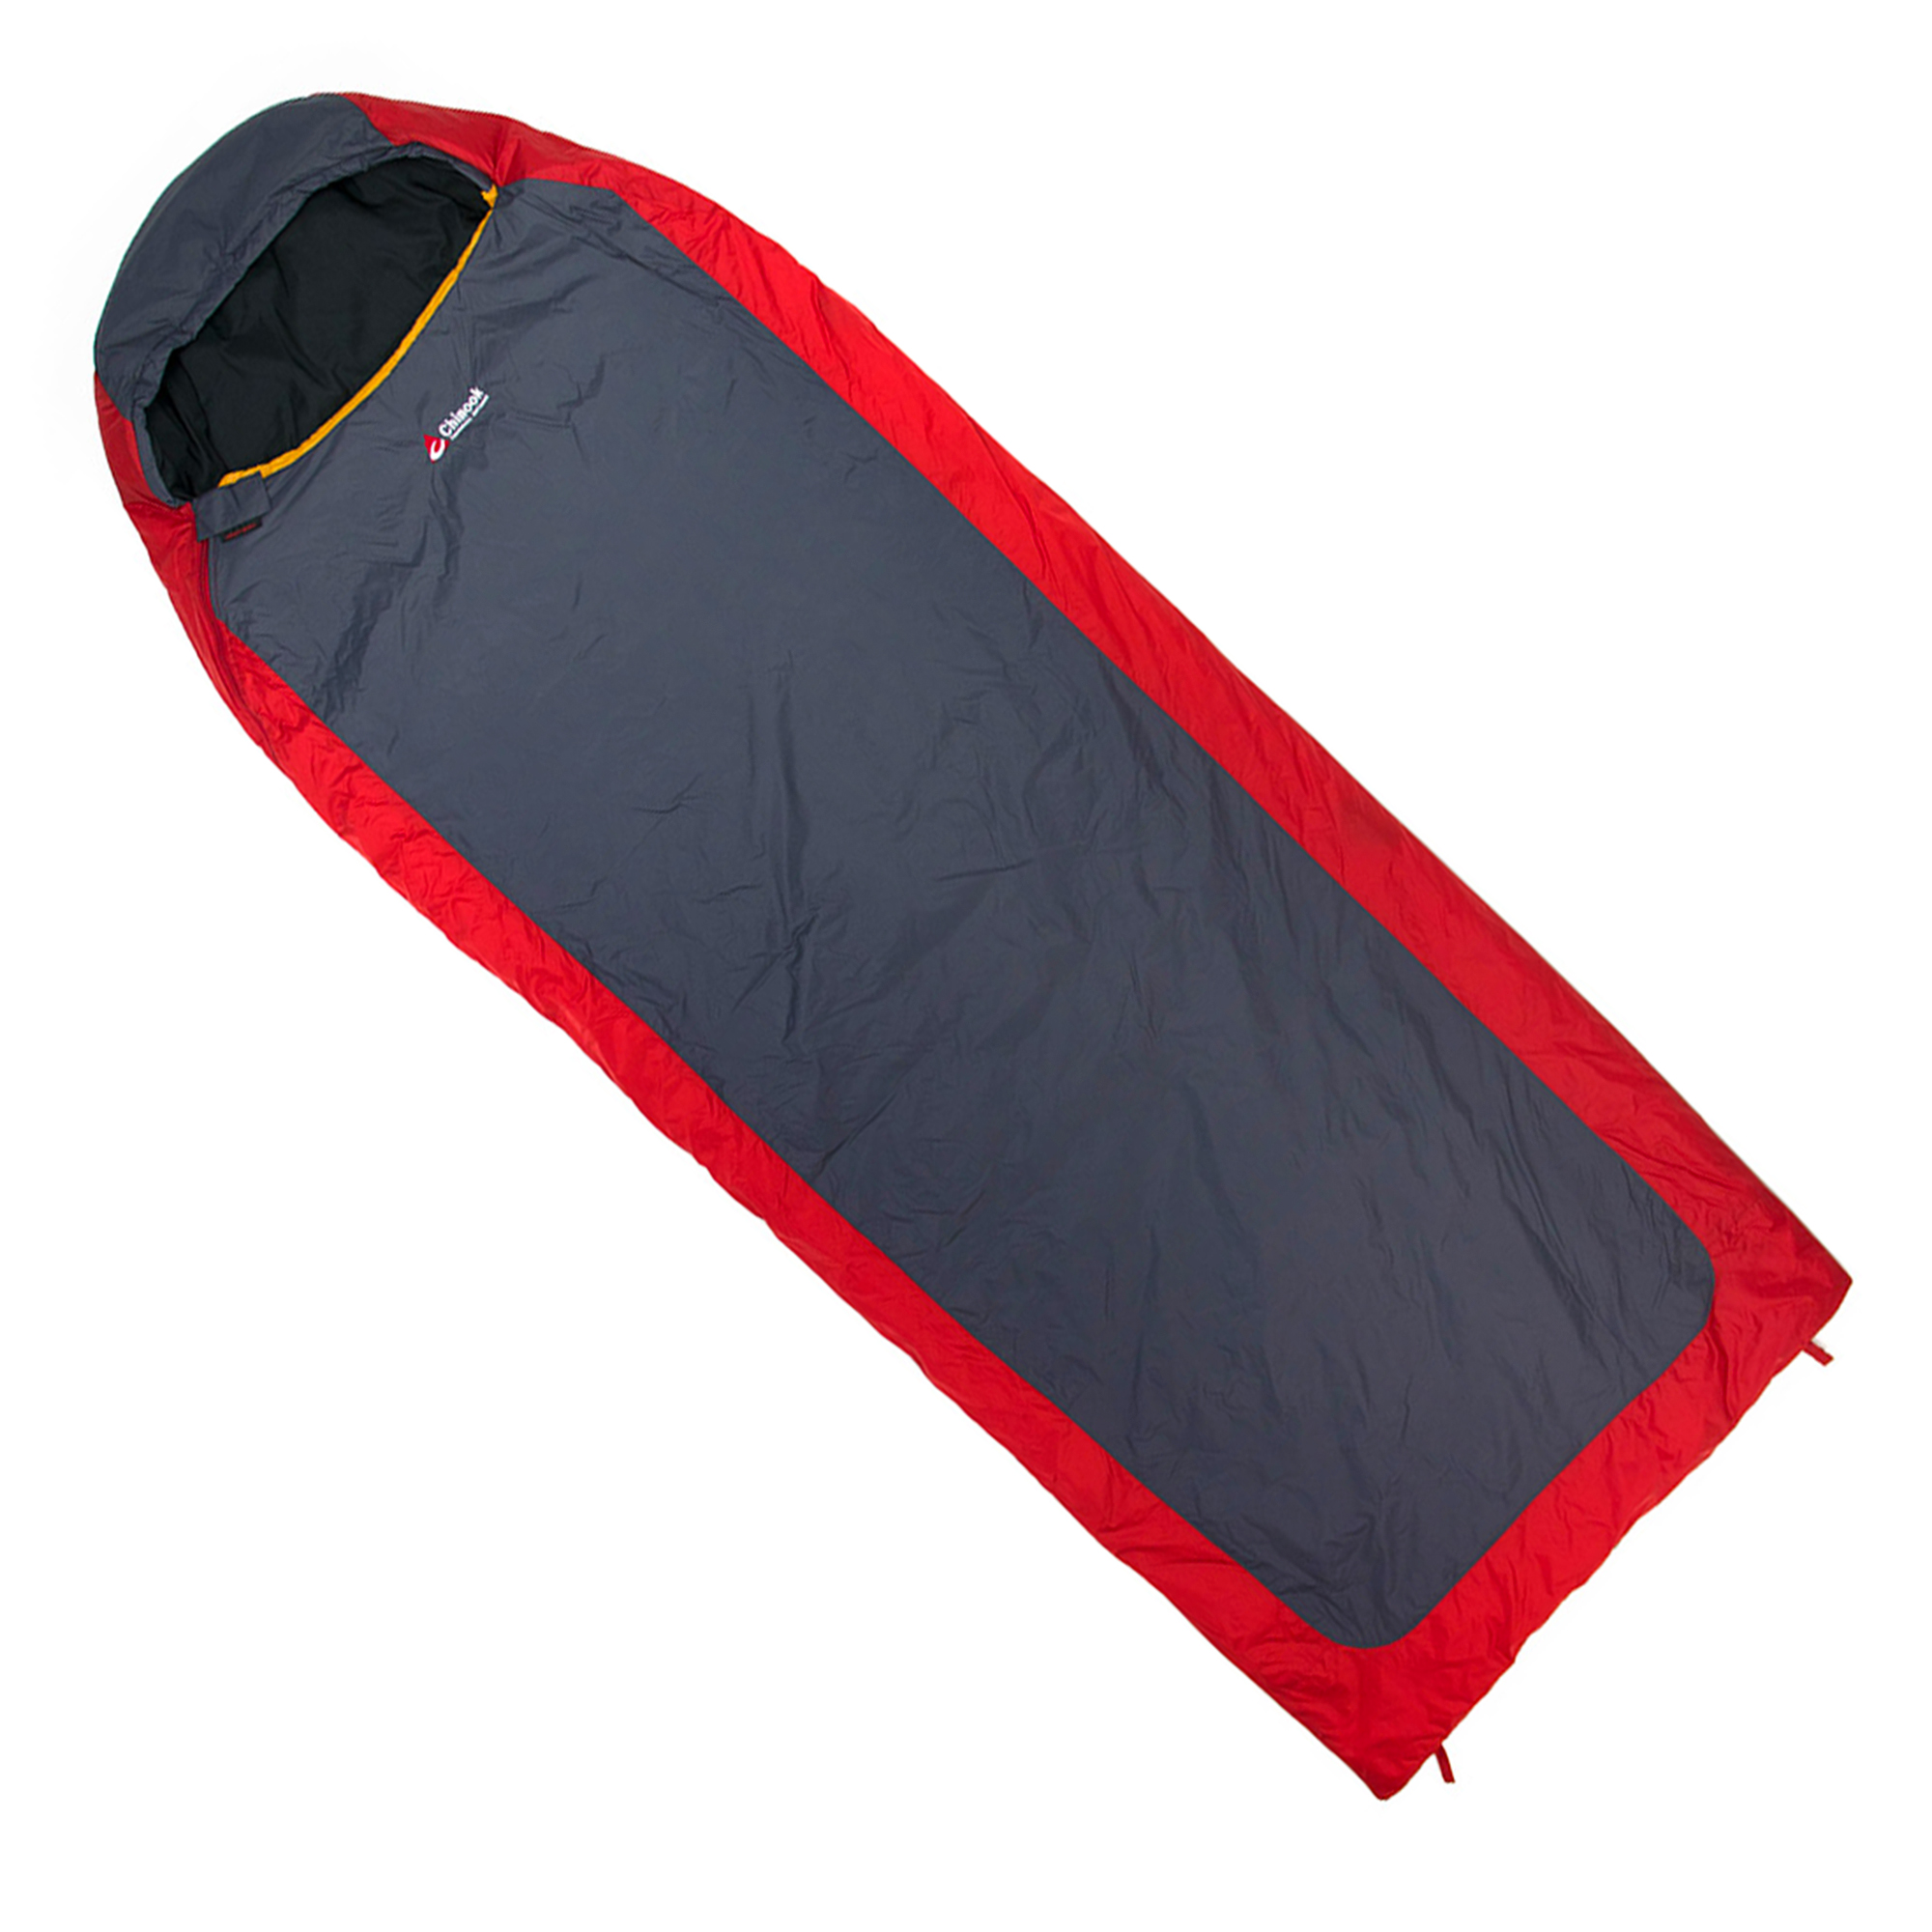 Chinook Mummy Sleeping Bag Everest Micro II 32� F, Red Gray by Chinook